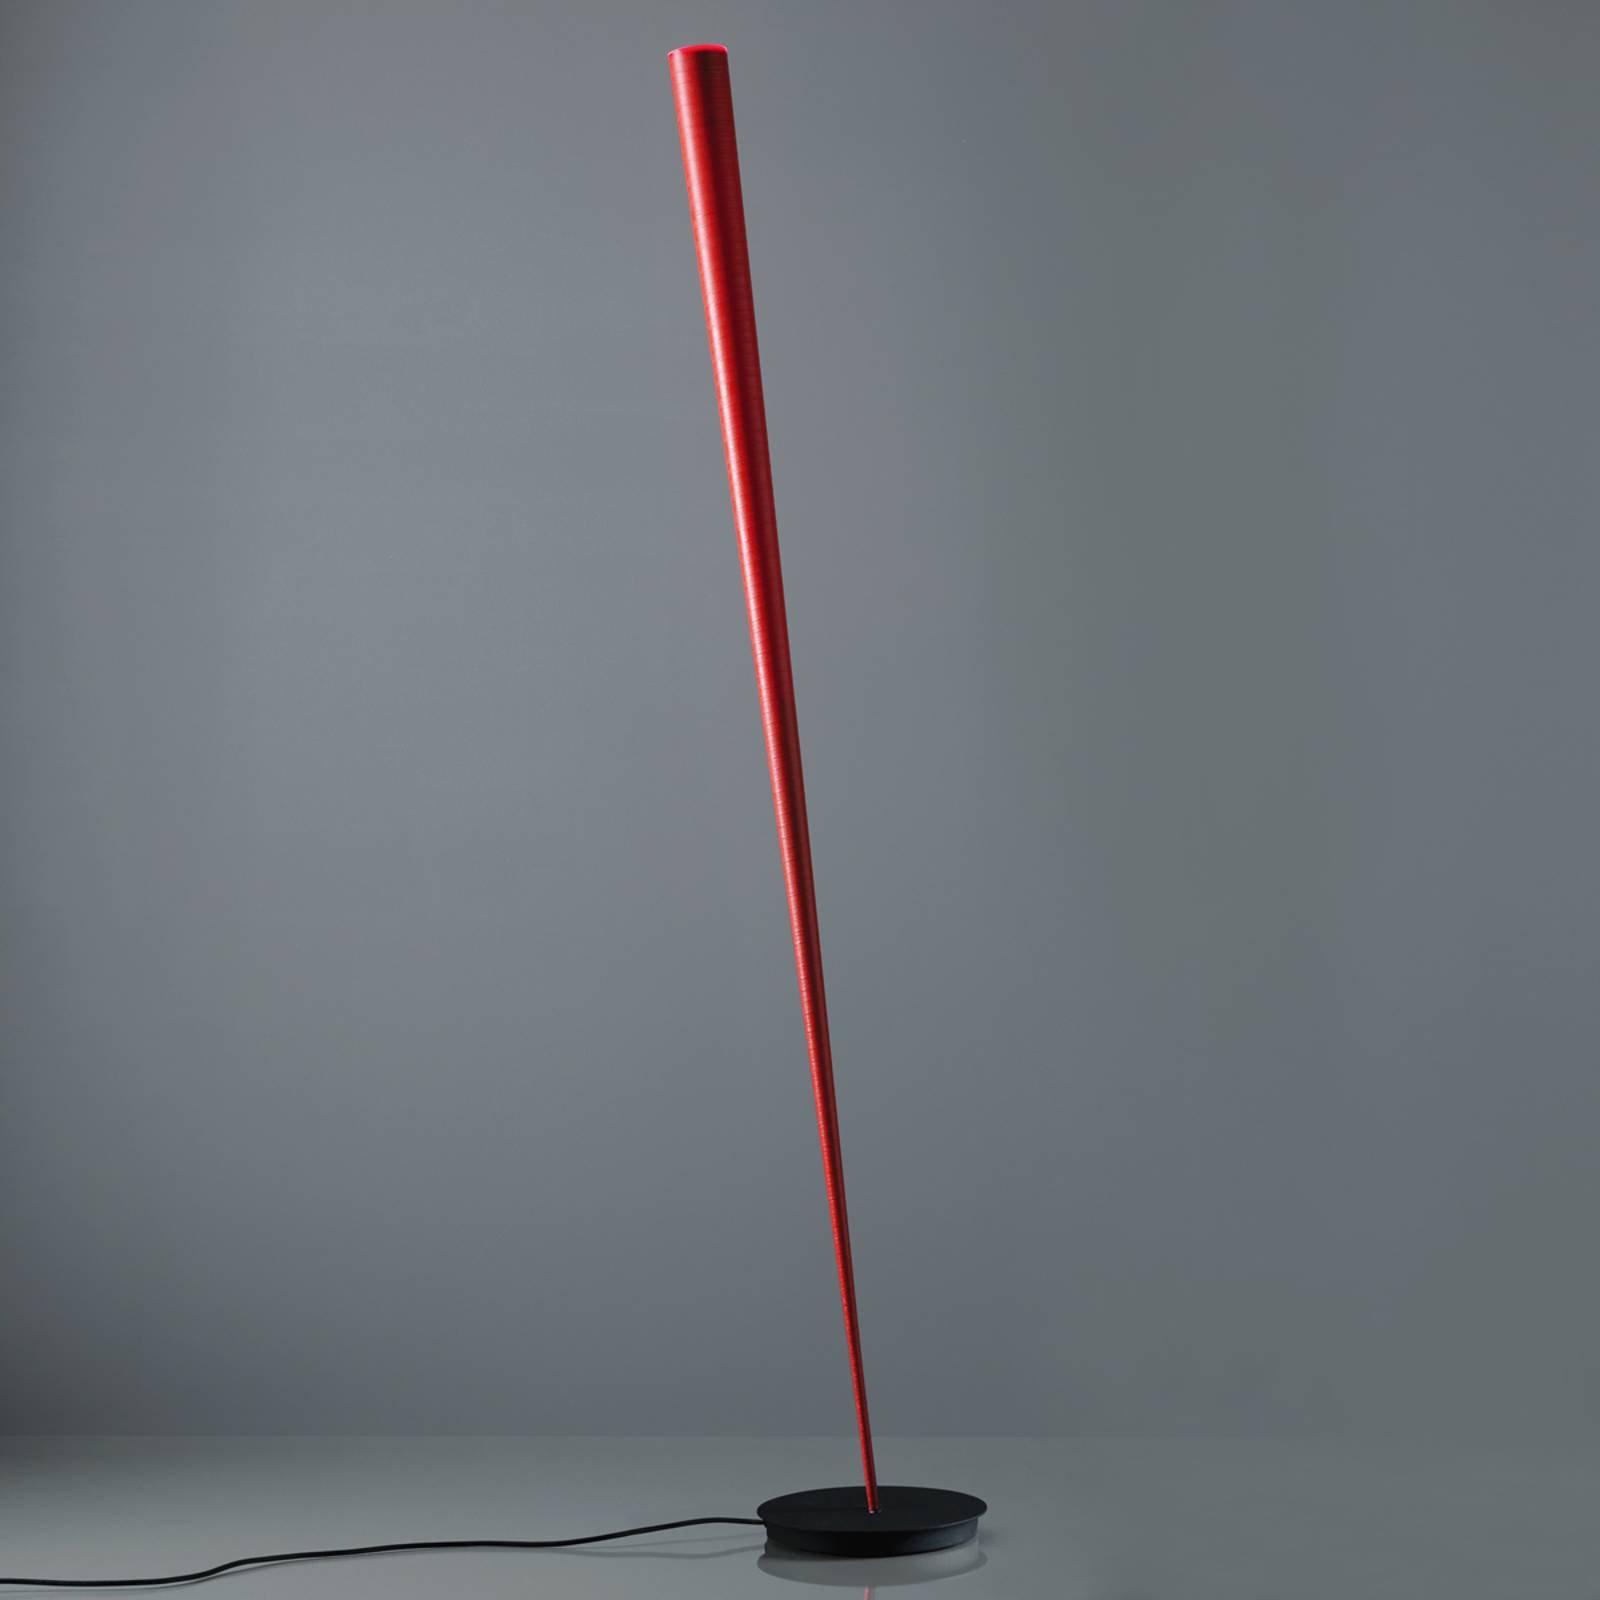 Designer-gulvlampe Drik, rød